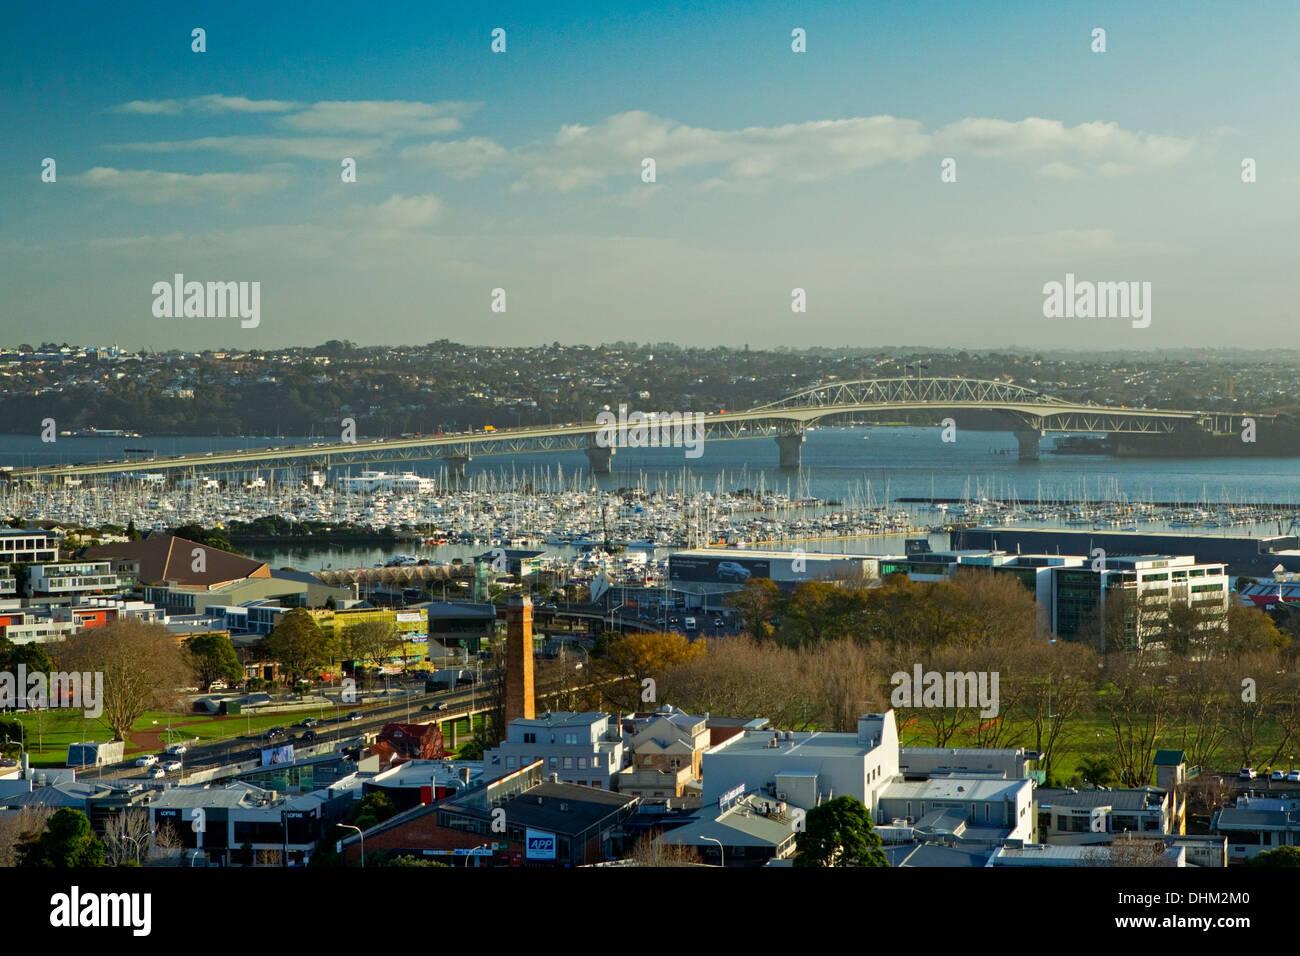 View of Harbour Bridge, Auckland, Monday, July 08, 2013. - Stock Image